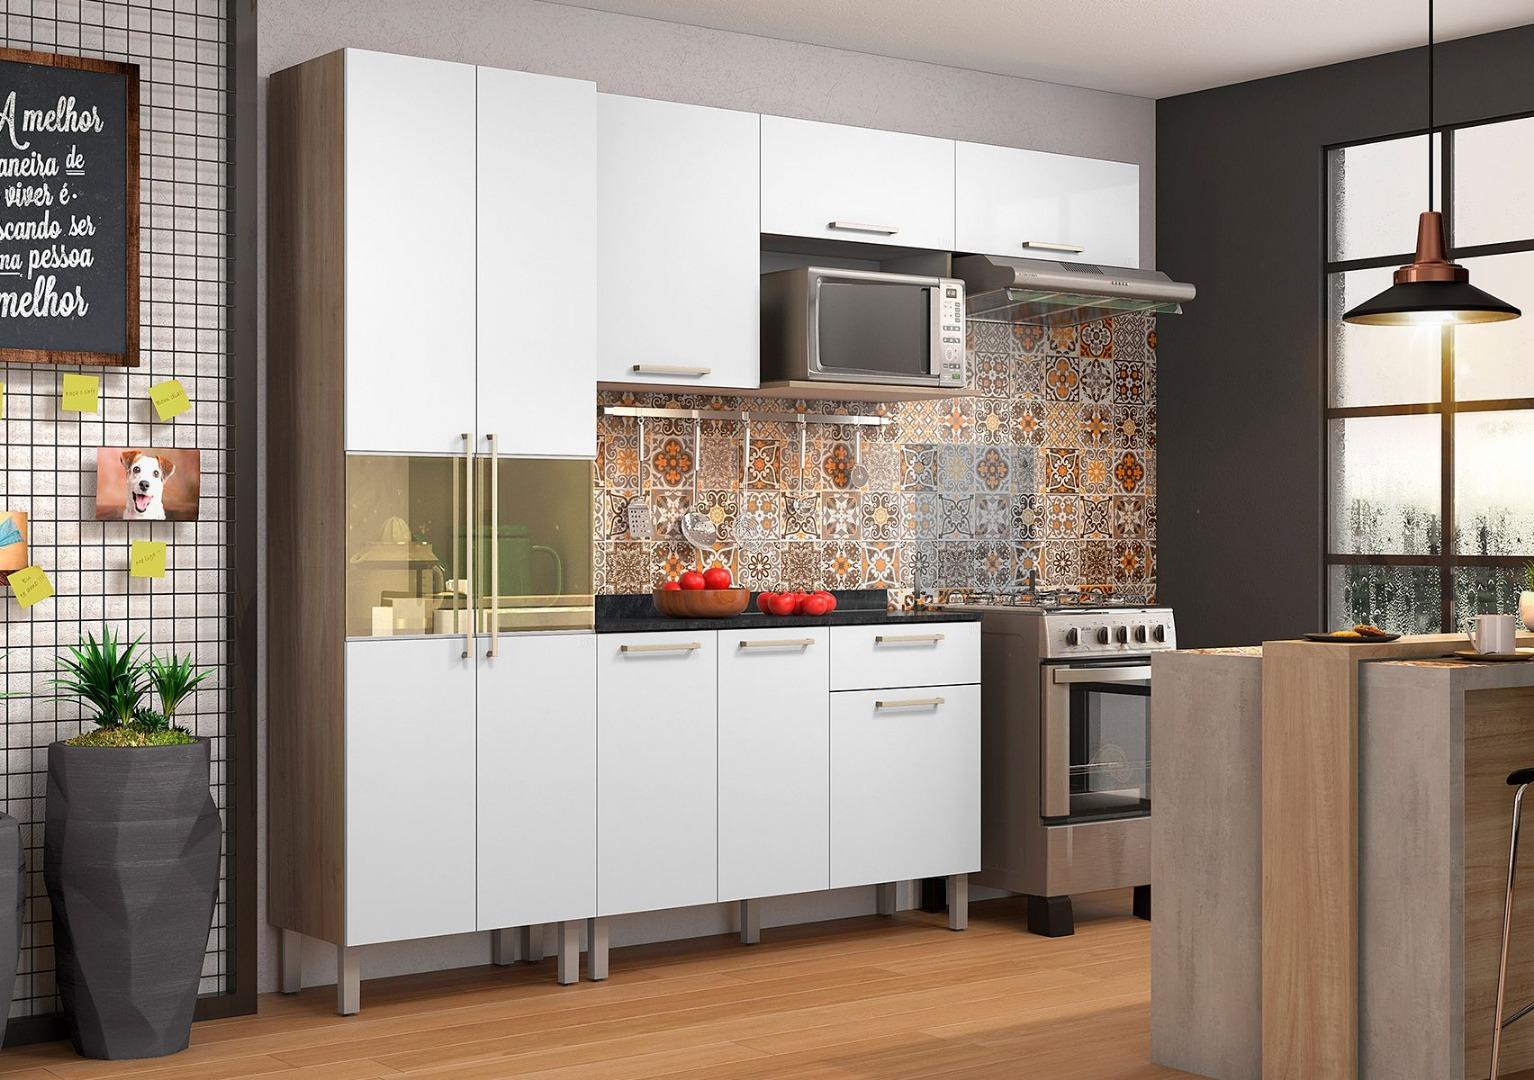 Cozinha Star Itatiaia - Aveiro Branco